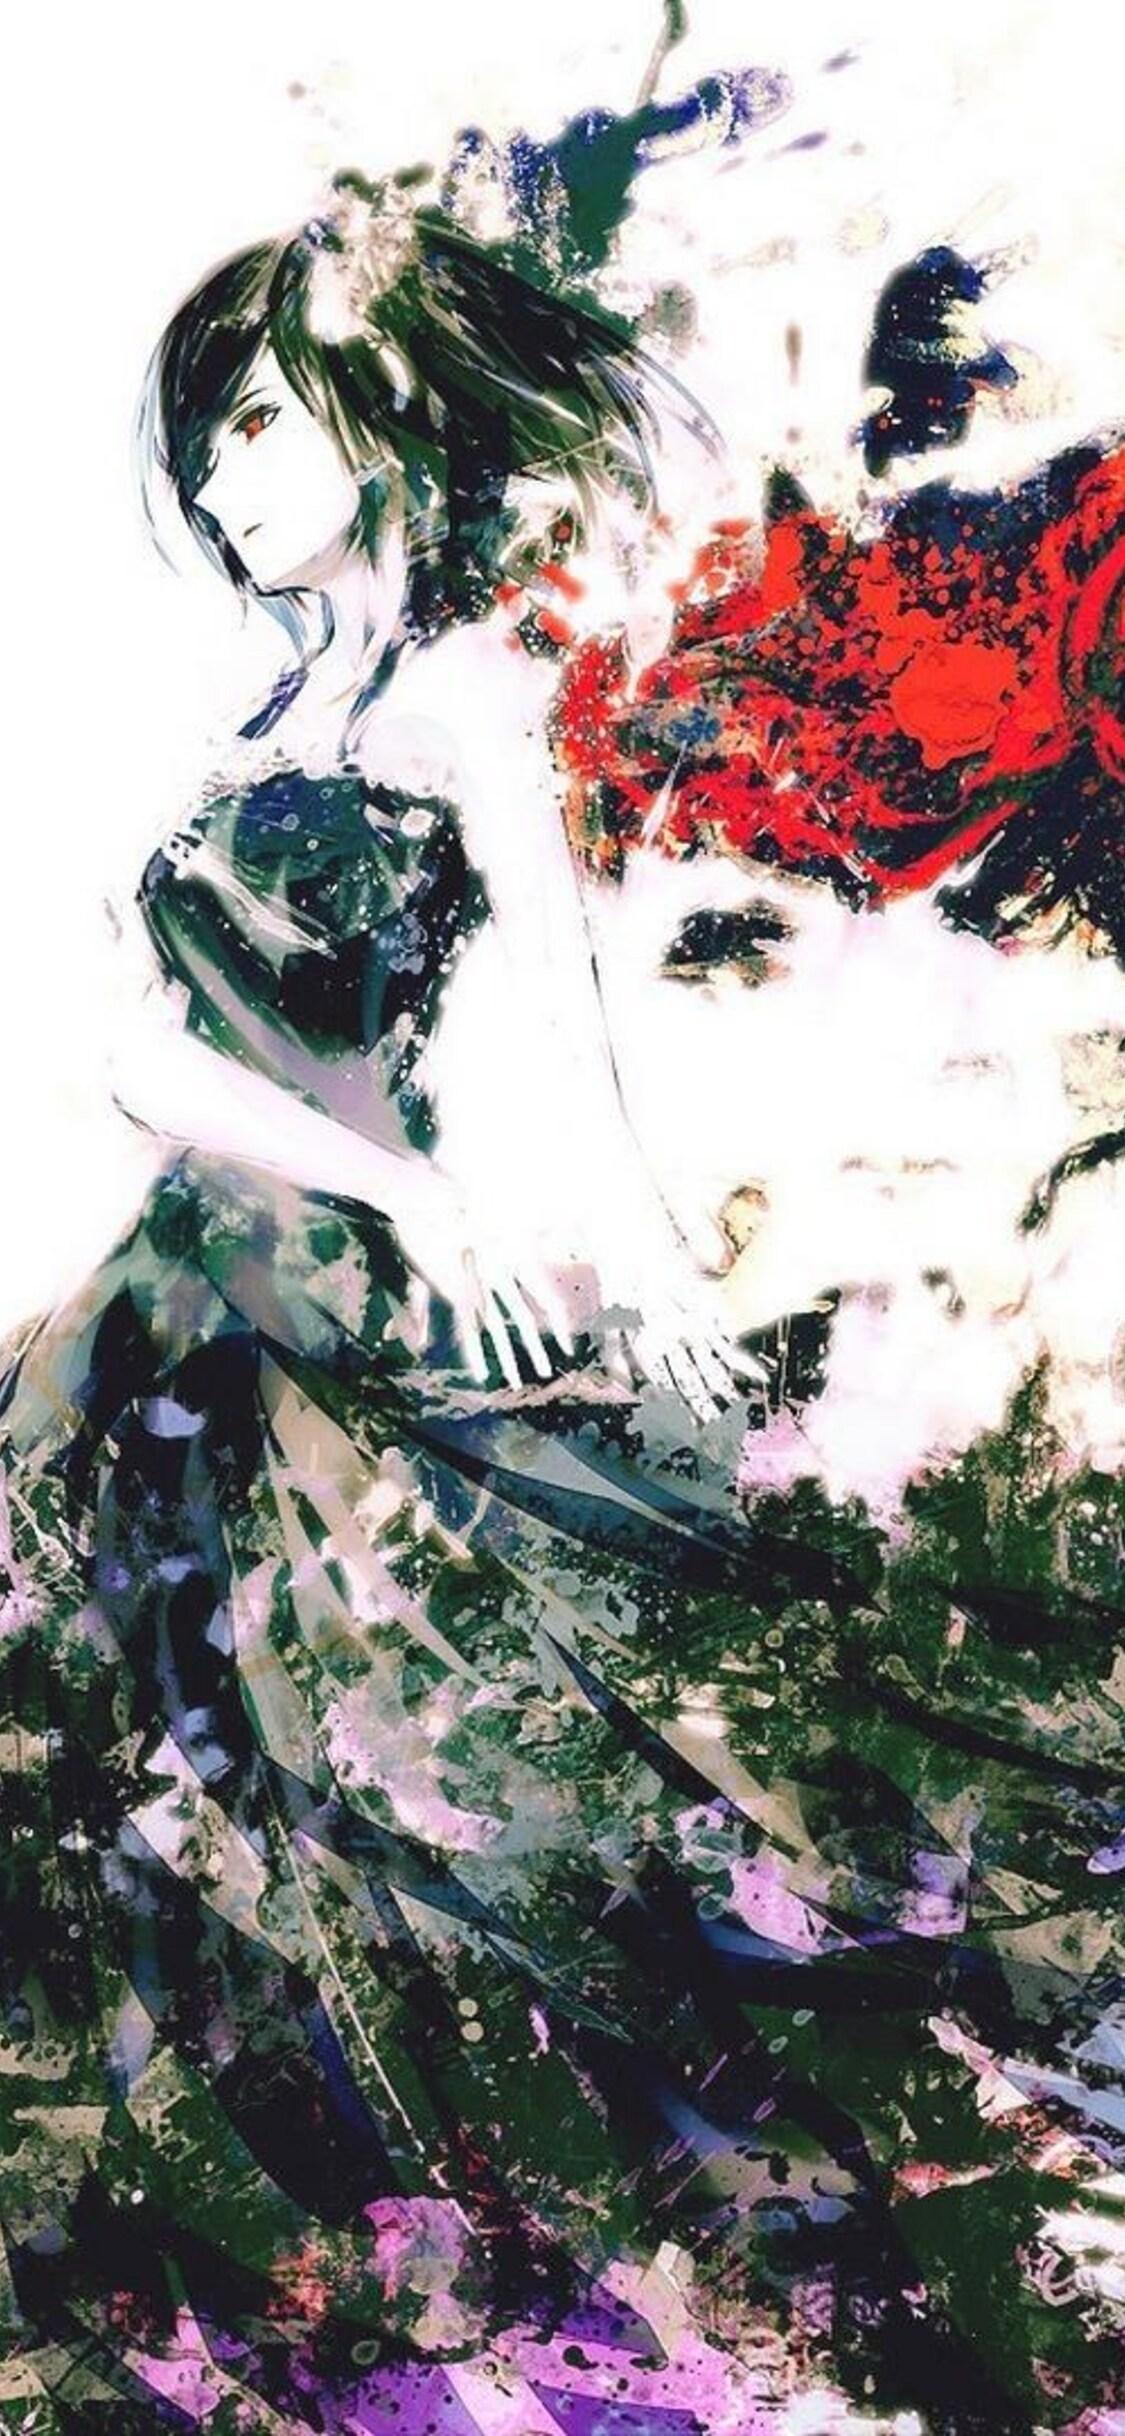 1125x2436 Tokyo Ghoul Art Anime Iphone Xs Iphone 10 Iphone X Hd 4k